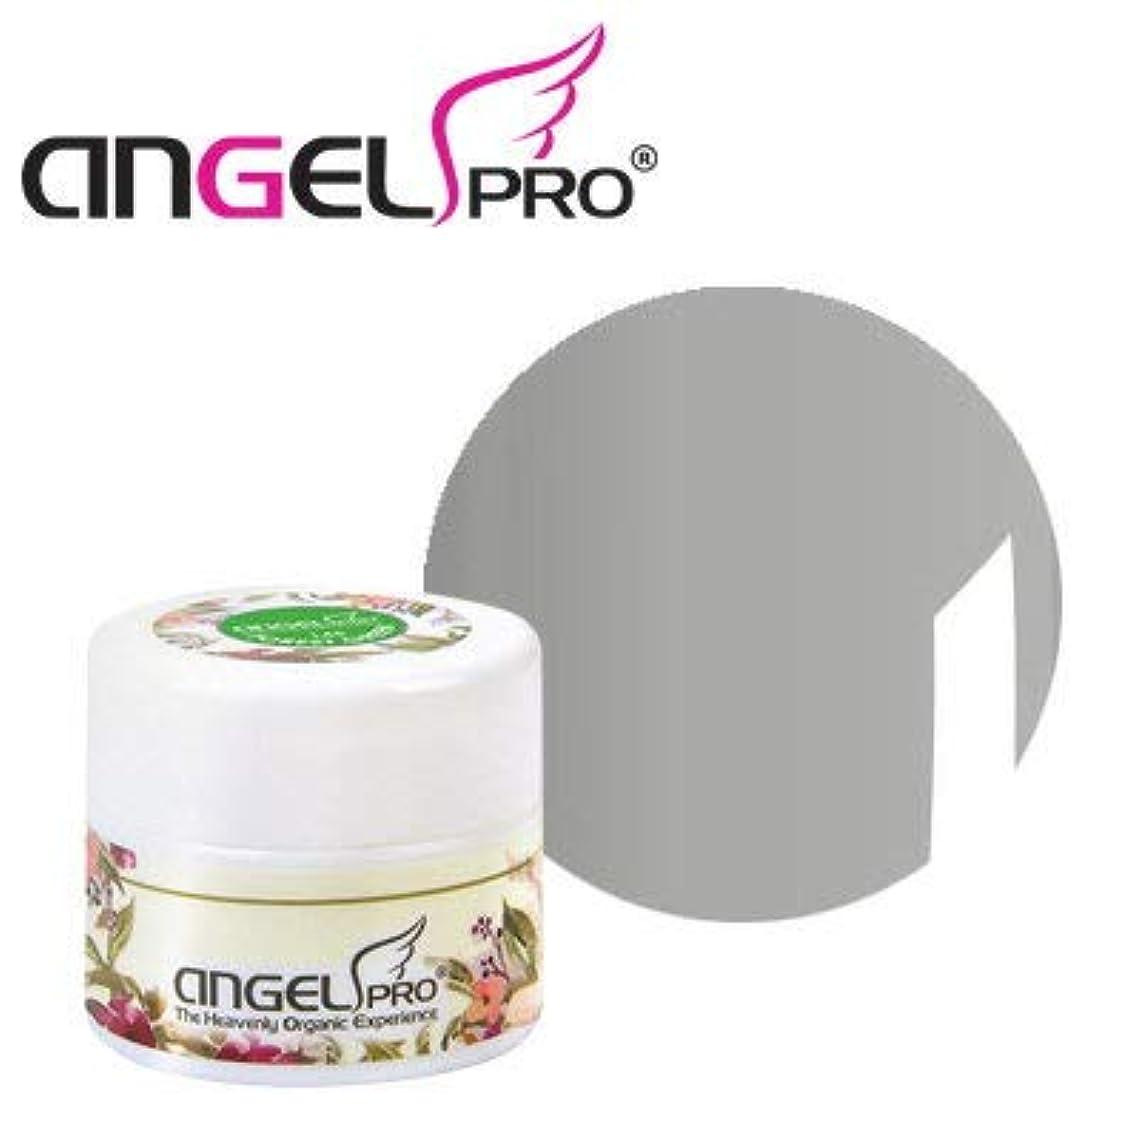 ANGEL PRO ポットジェリー #195 SMOKE GREY 4g